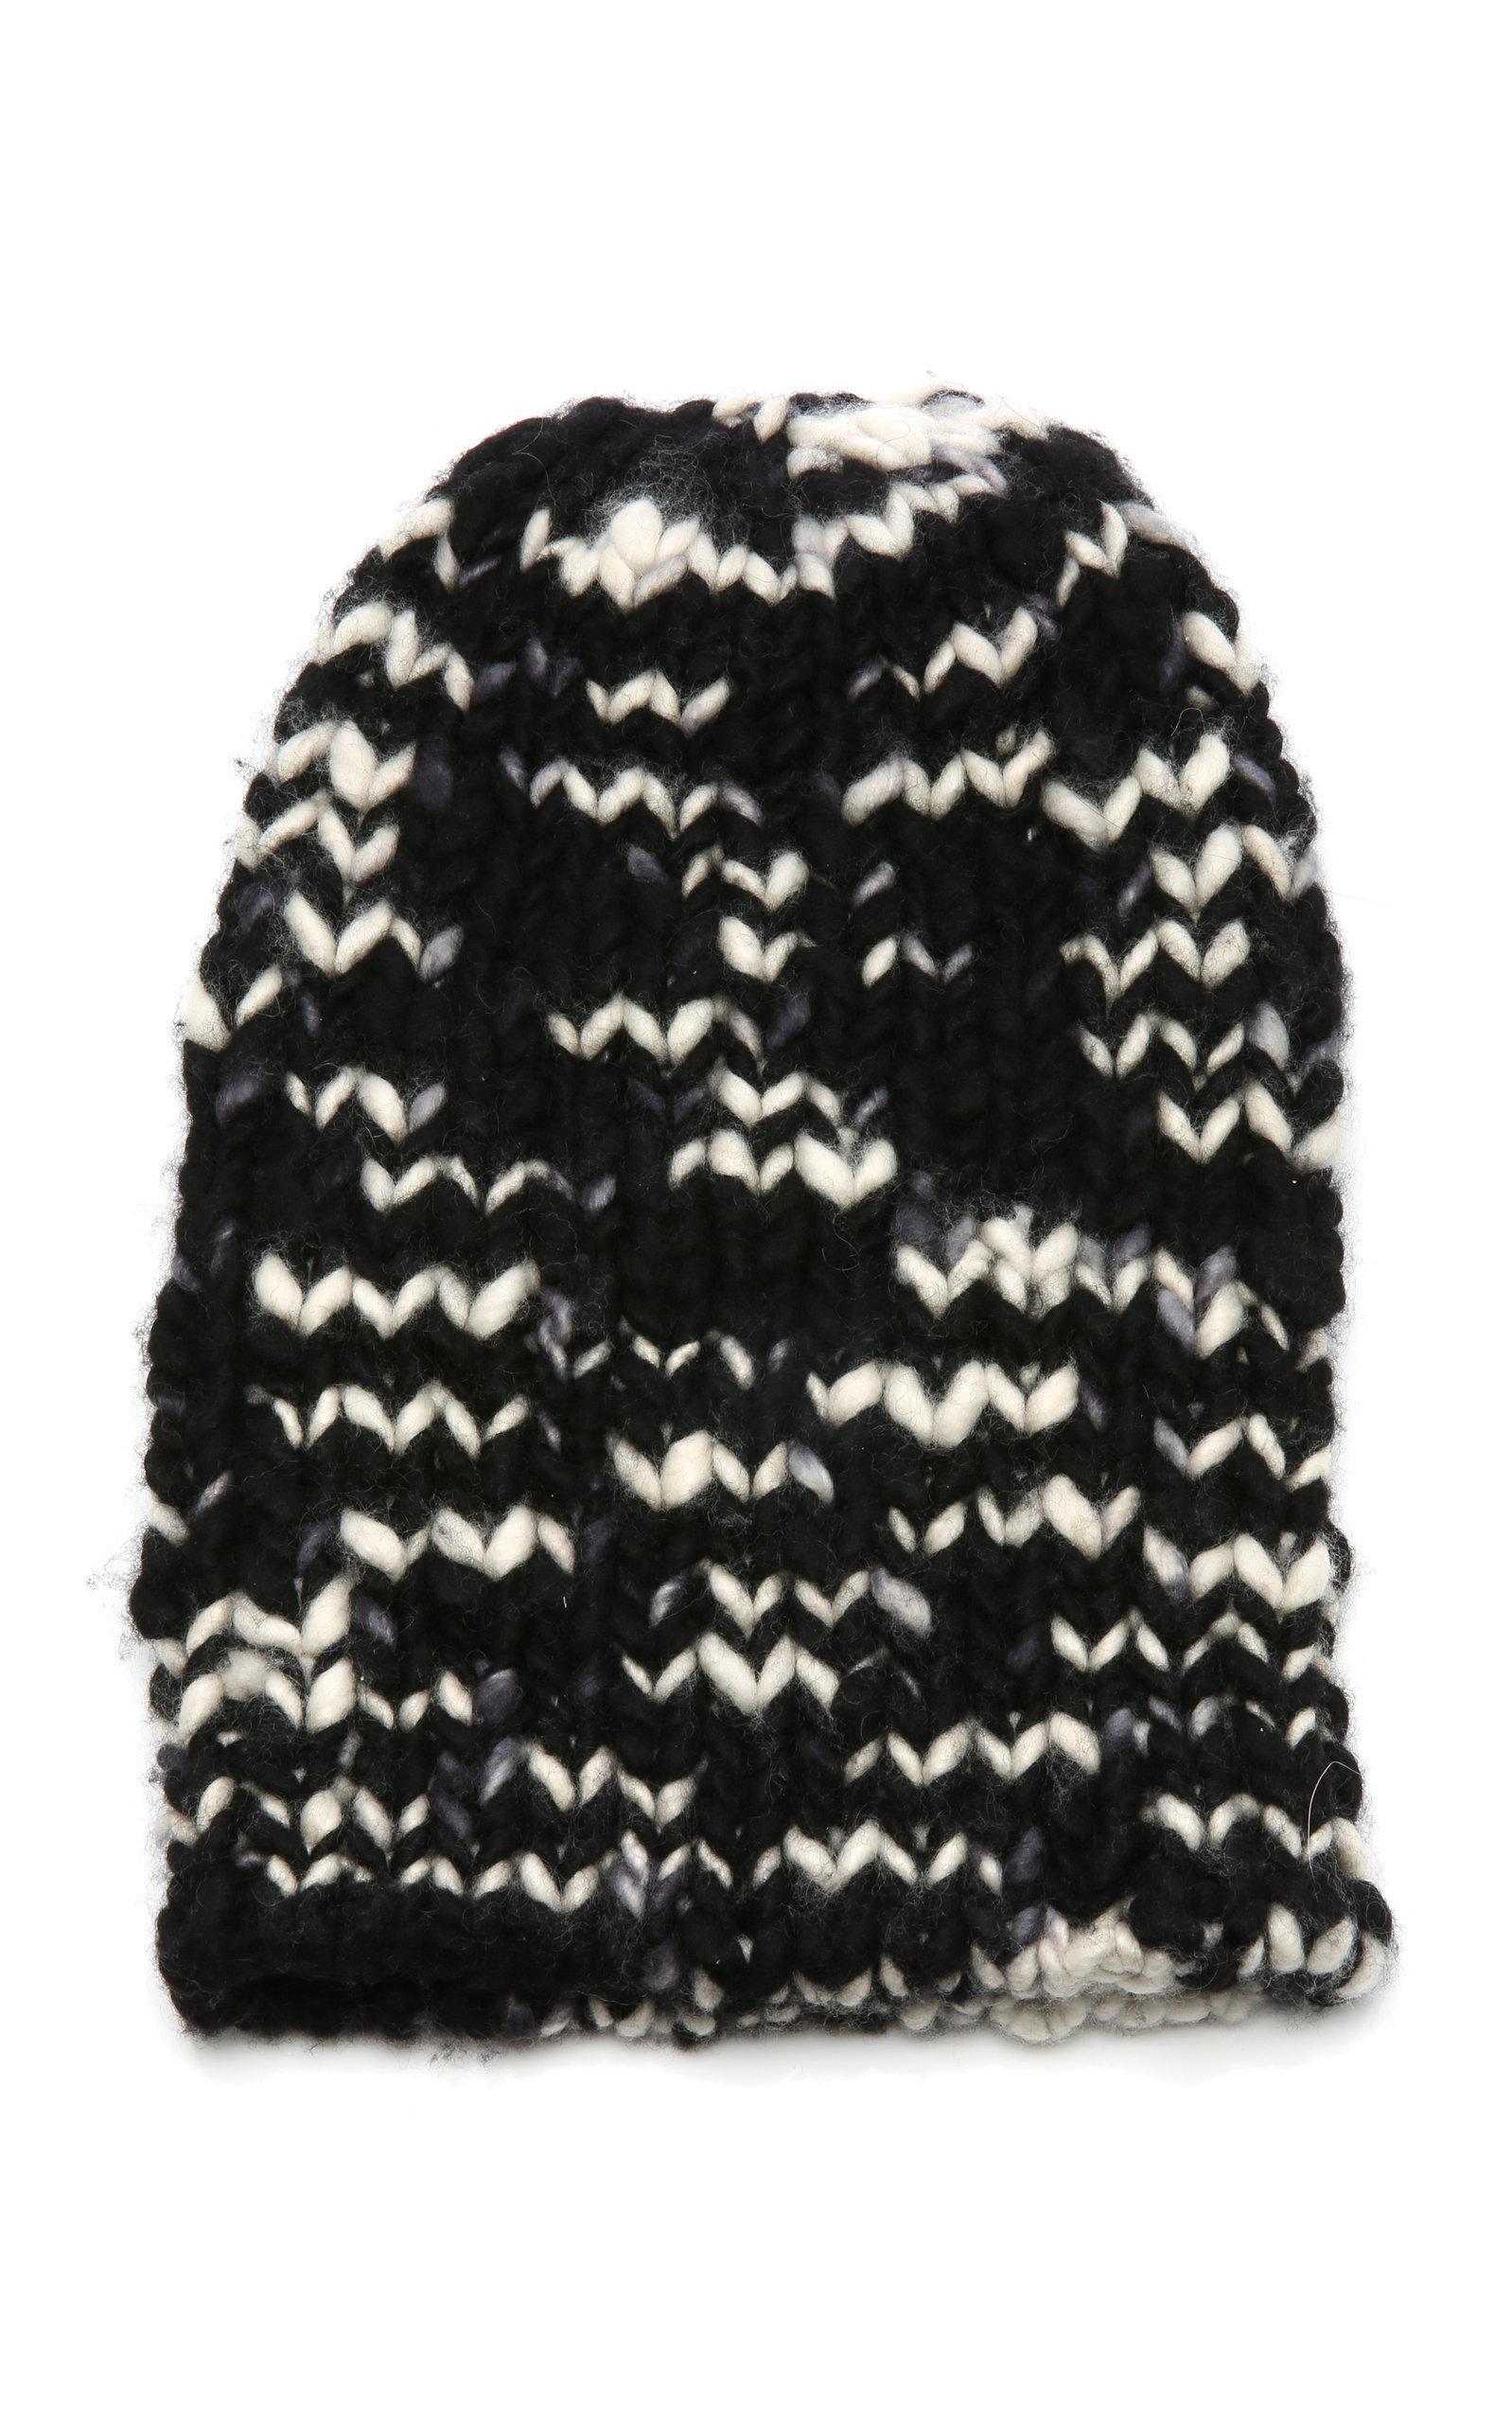 6bb9db770bbe7b The Elder Statesman Chunky Hand-Knit Cashmere Beanie In Black/White ...